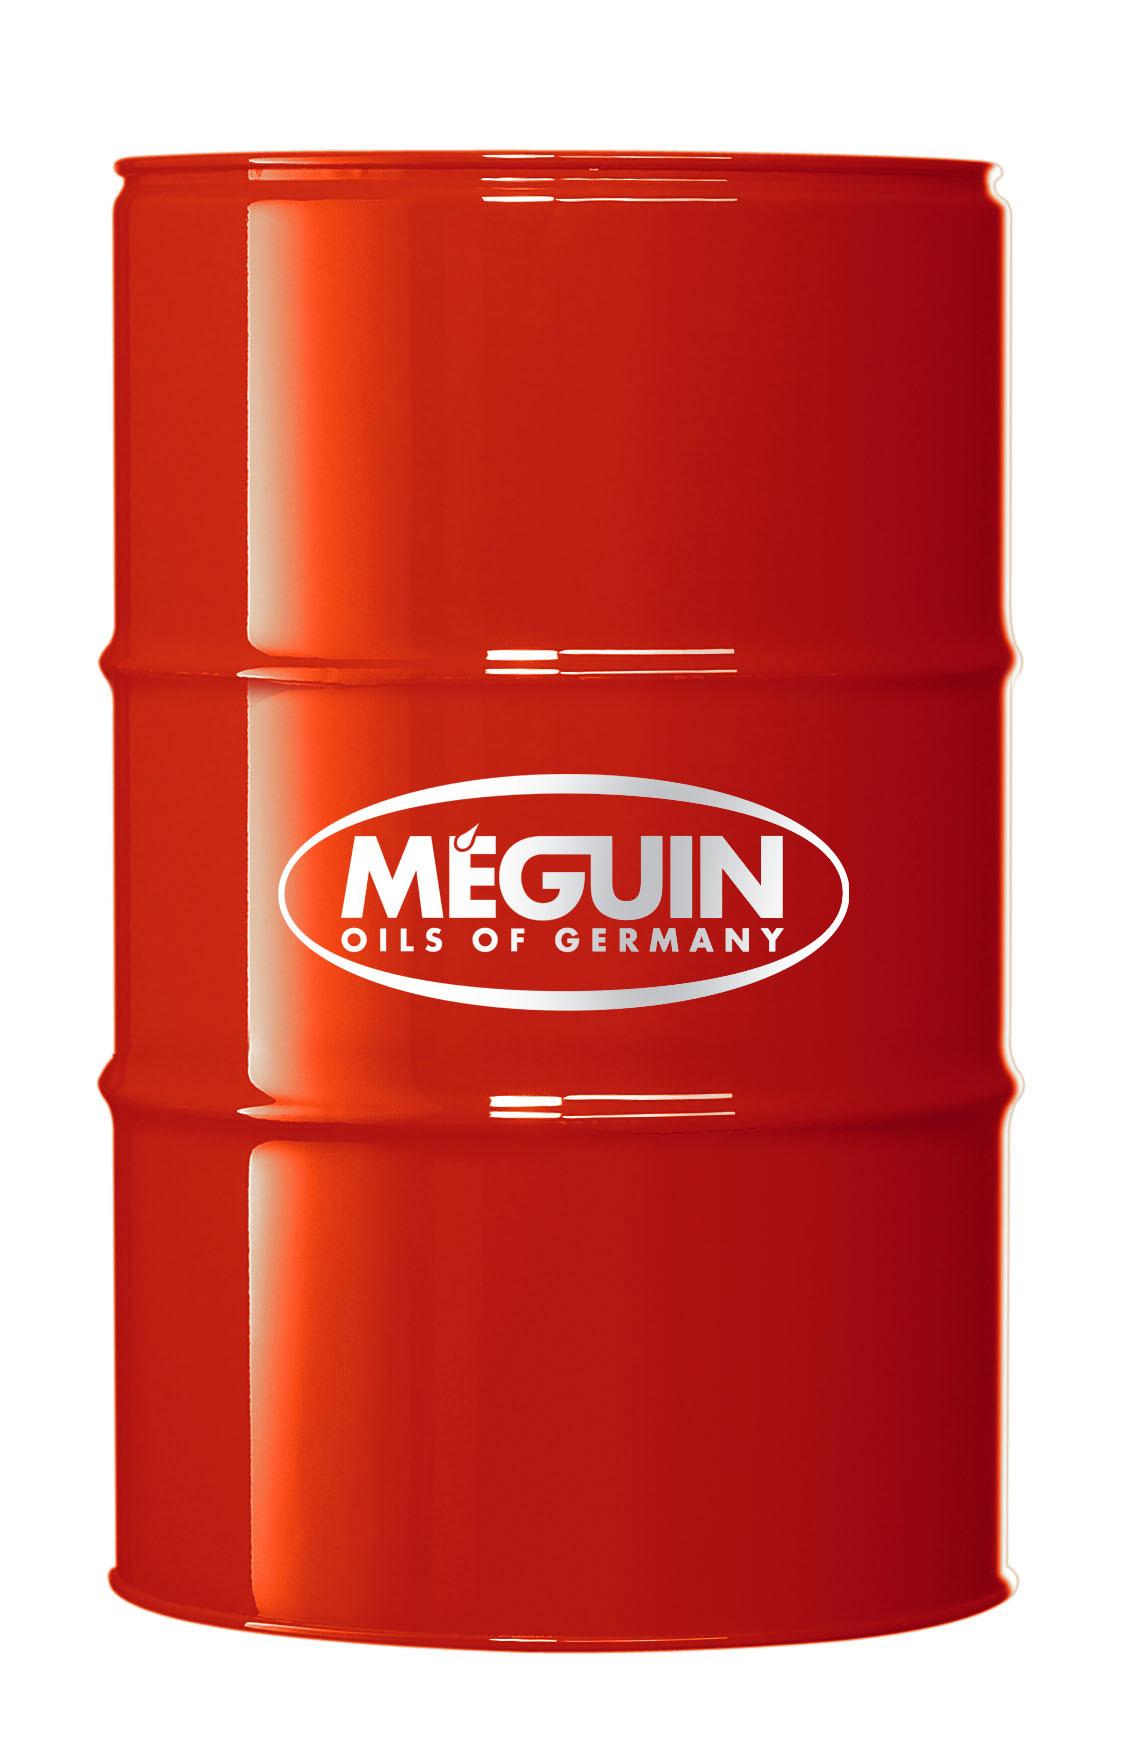 Meguin Super Leichtlauf FAMO R SAE 10W40 Моторное масло для смешанных автопарков